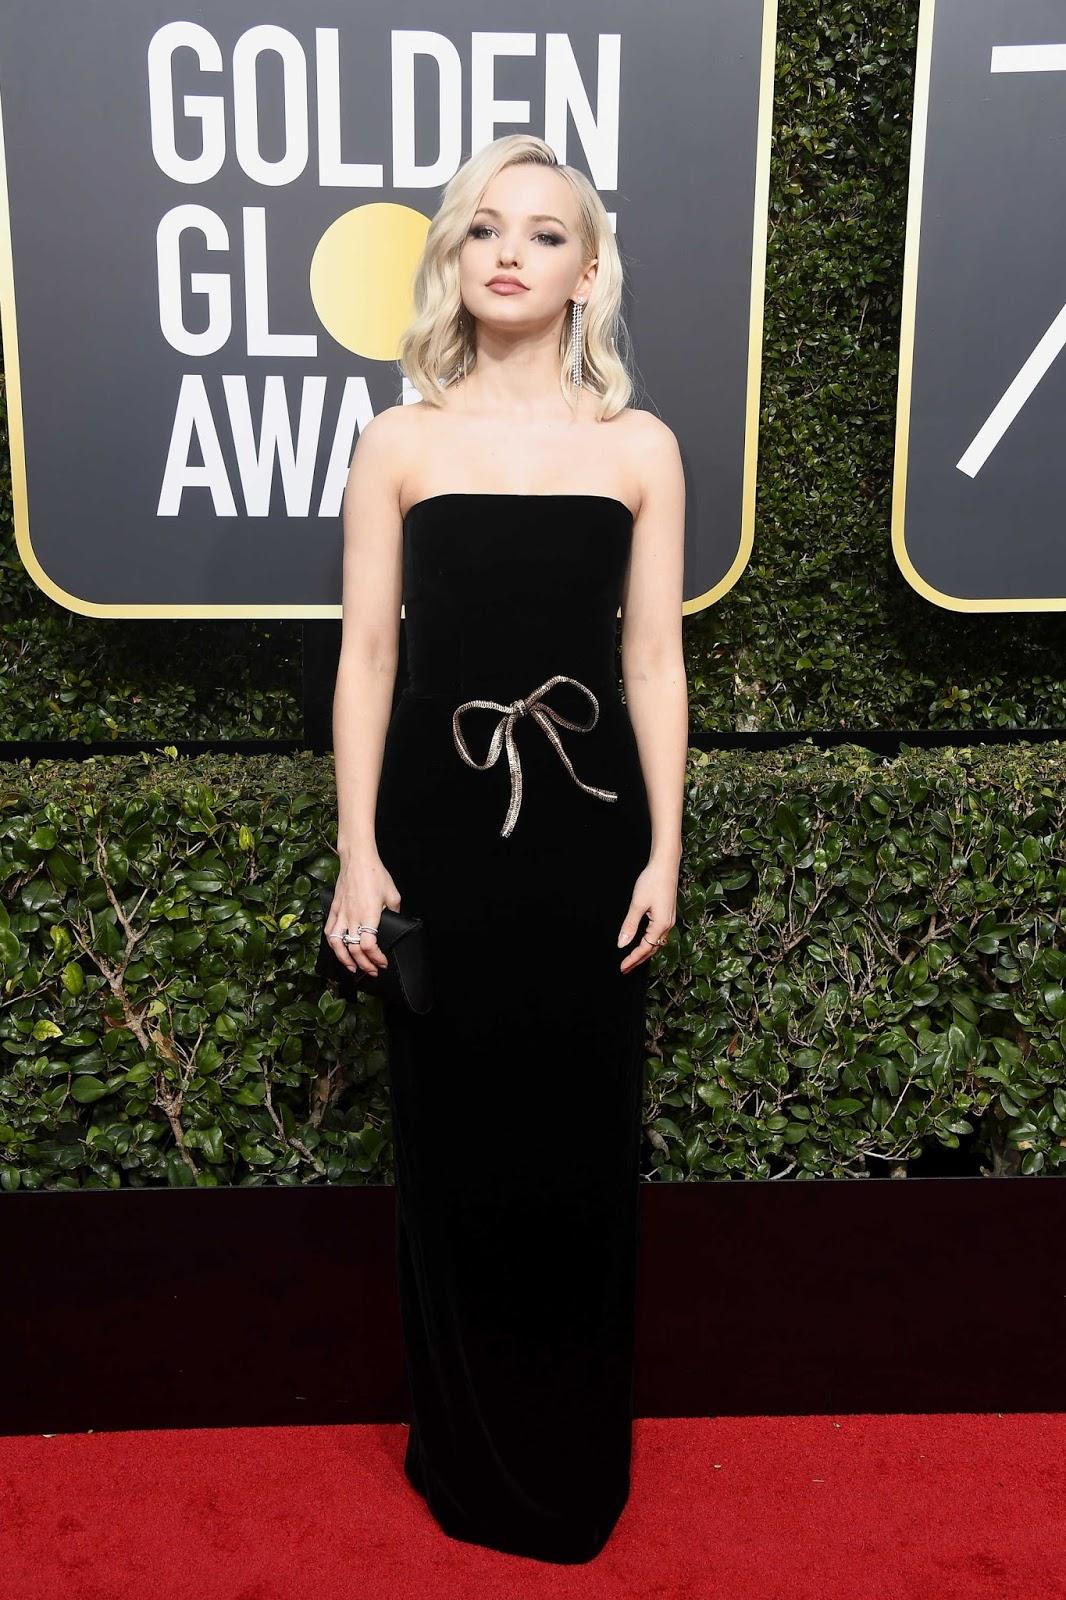 Dove Cameron Posing at  Golden Globe Awards